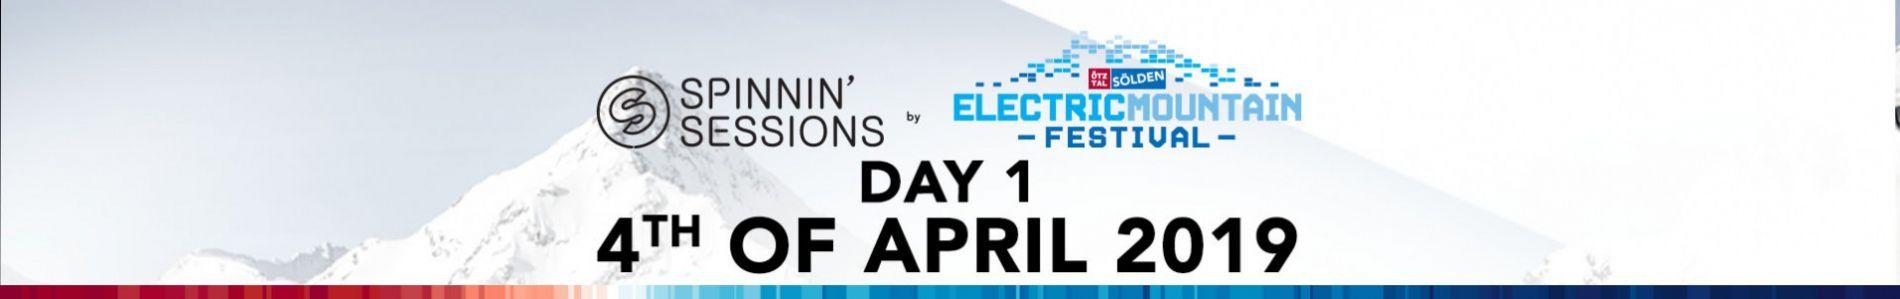 Win ski passes for Electric Mountain Festival!